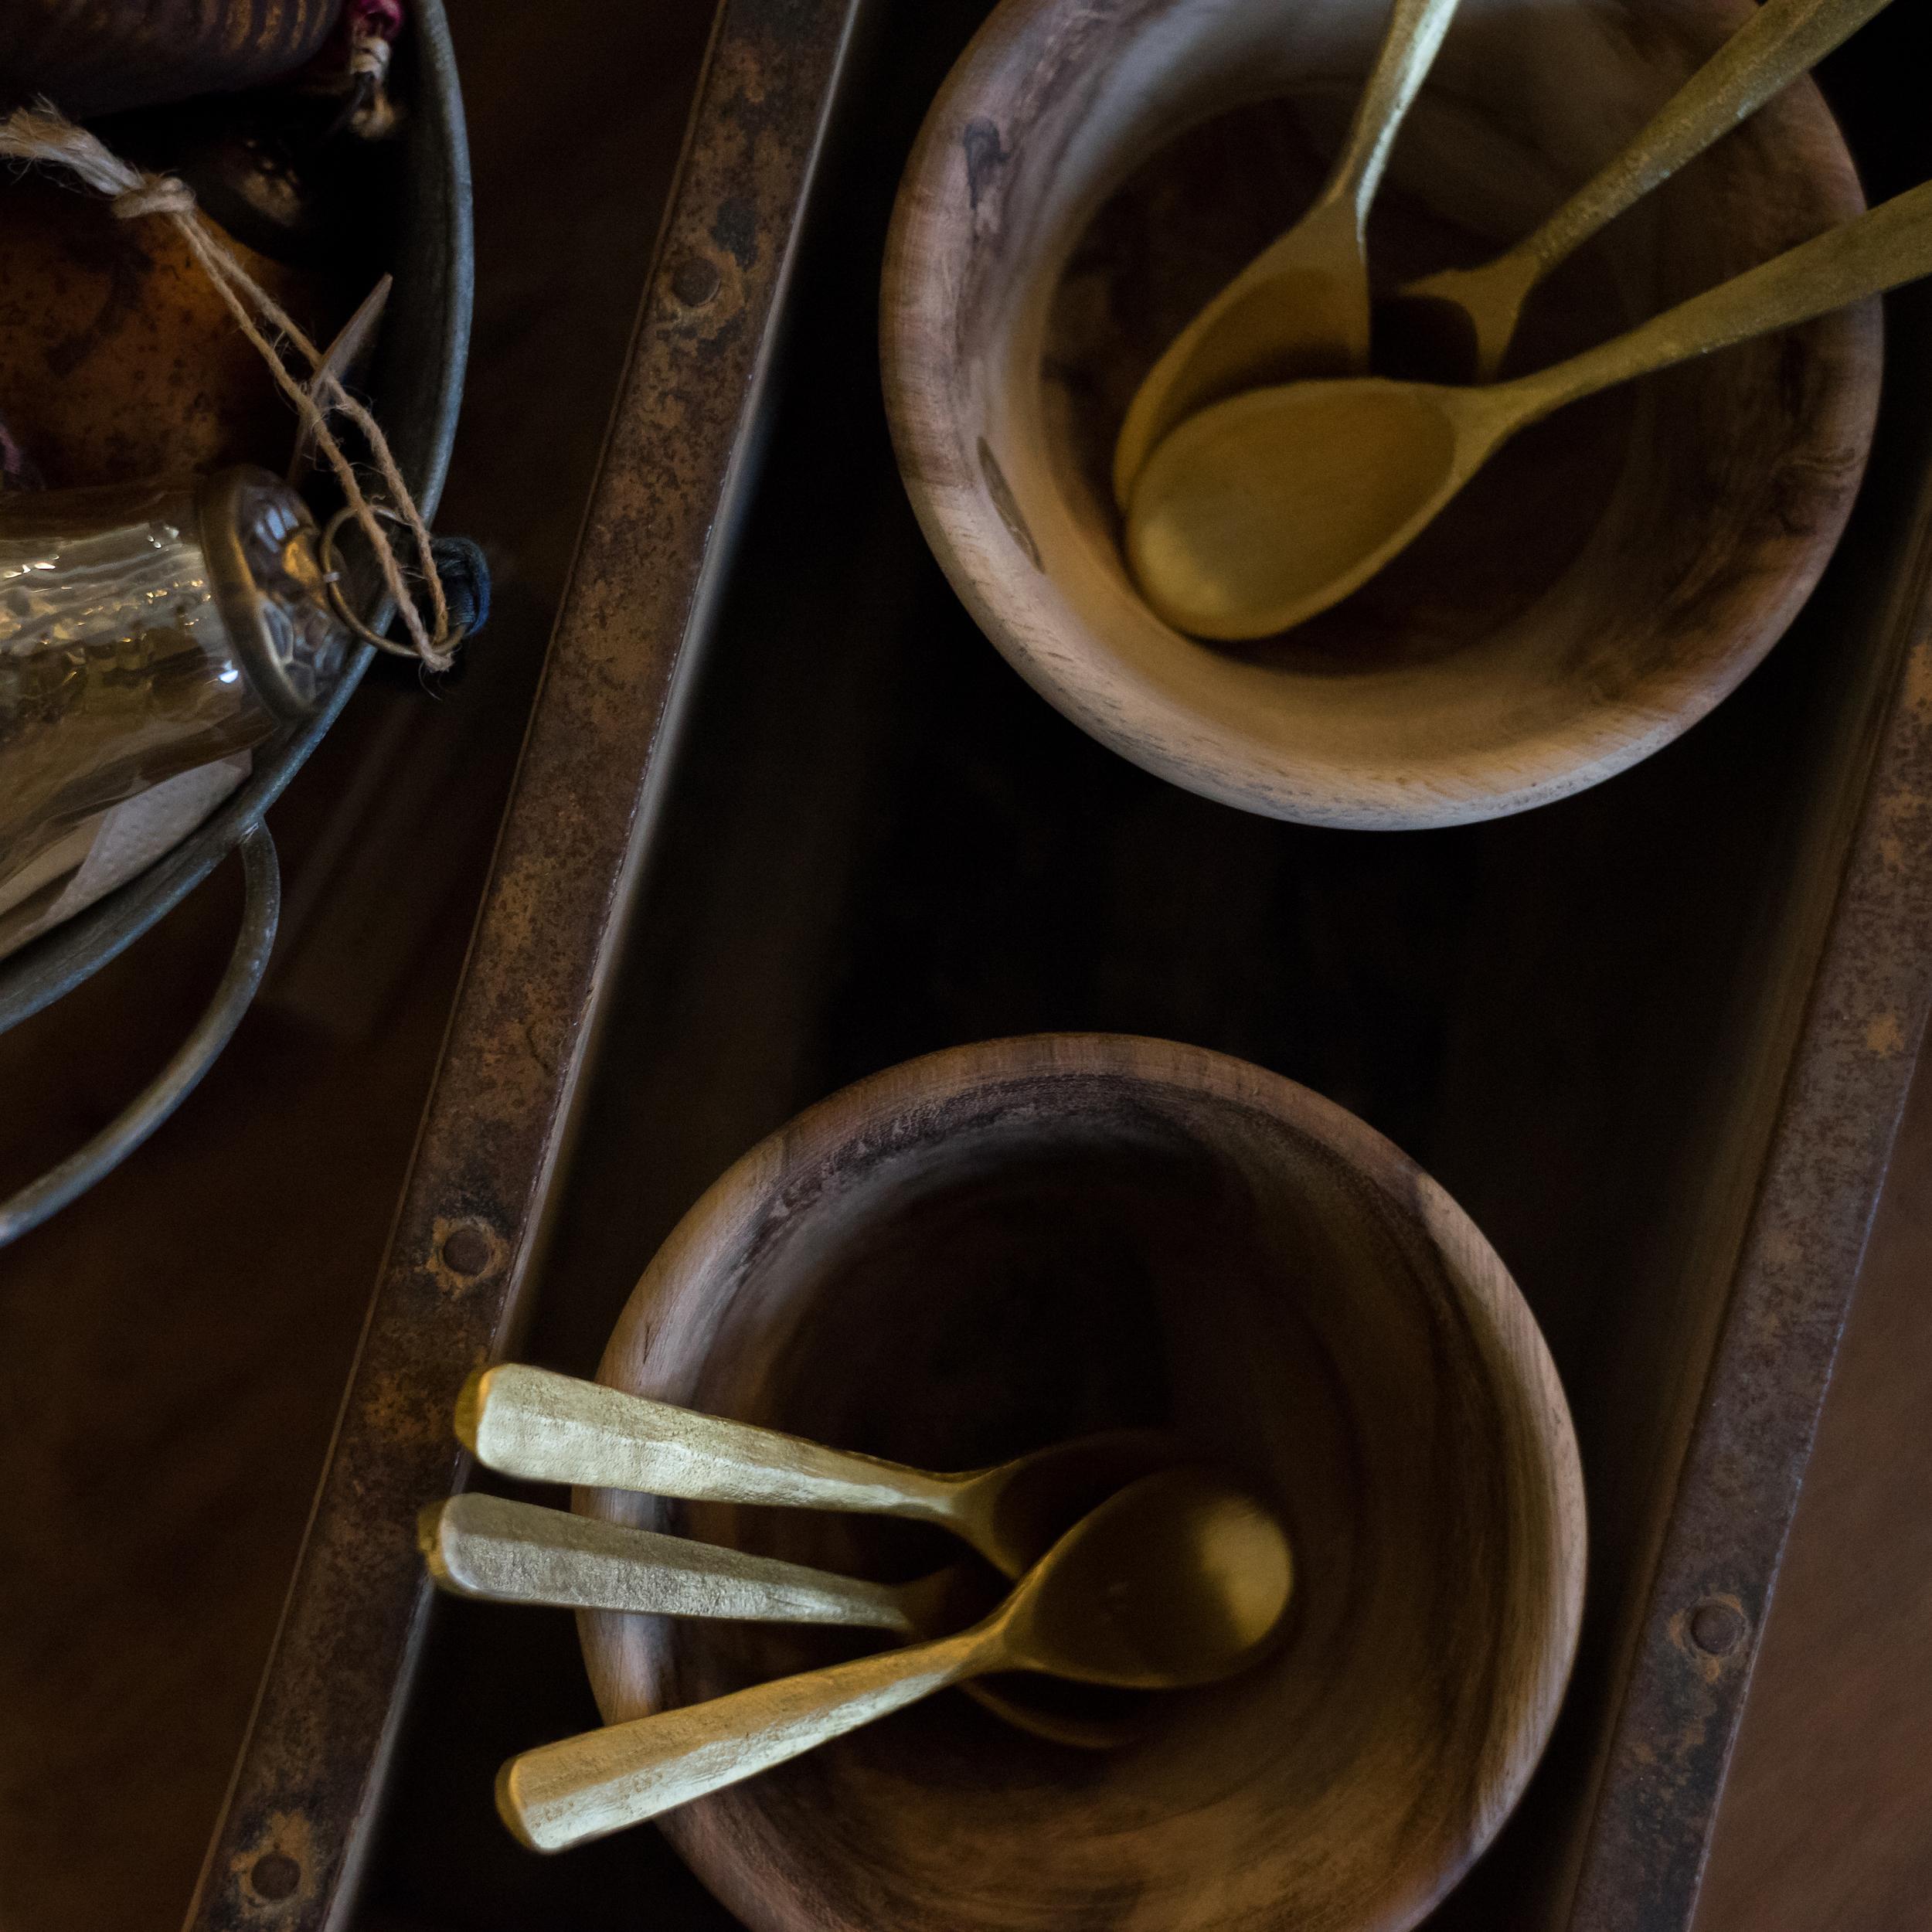 lavender and bone nkuku brass spoonsjpg.jpg